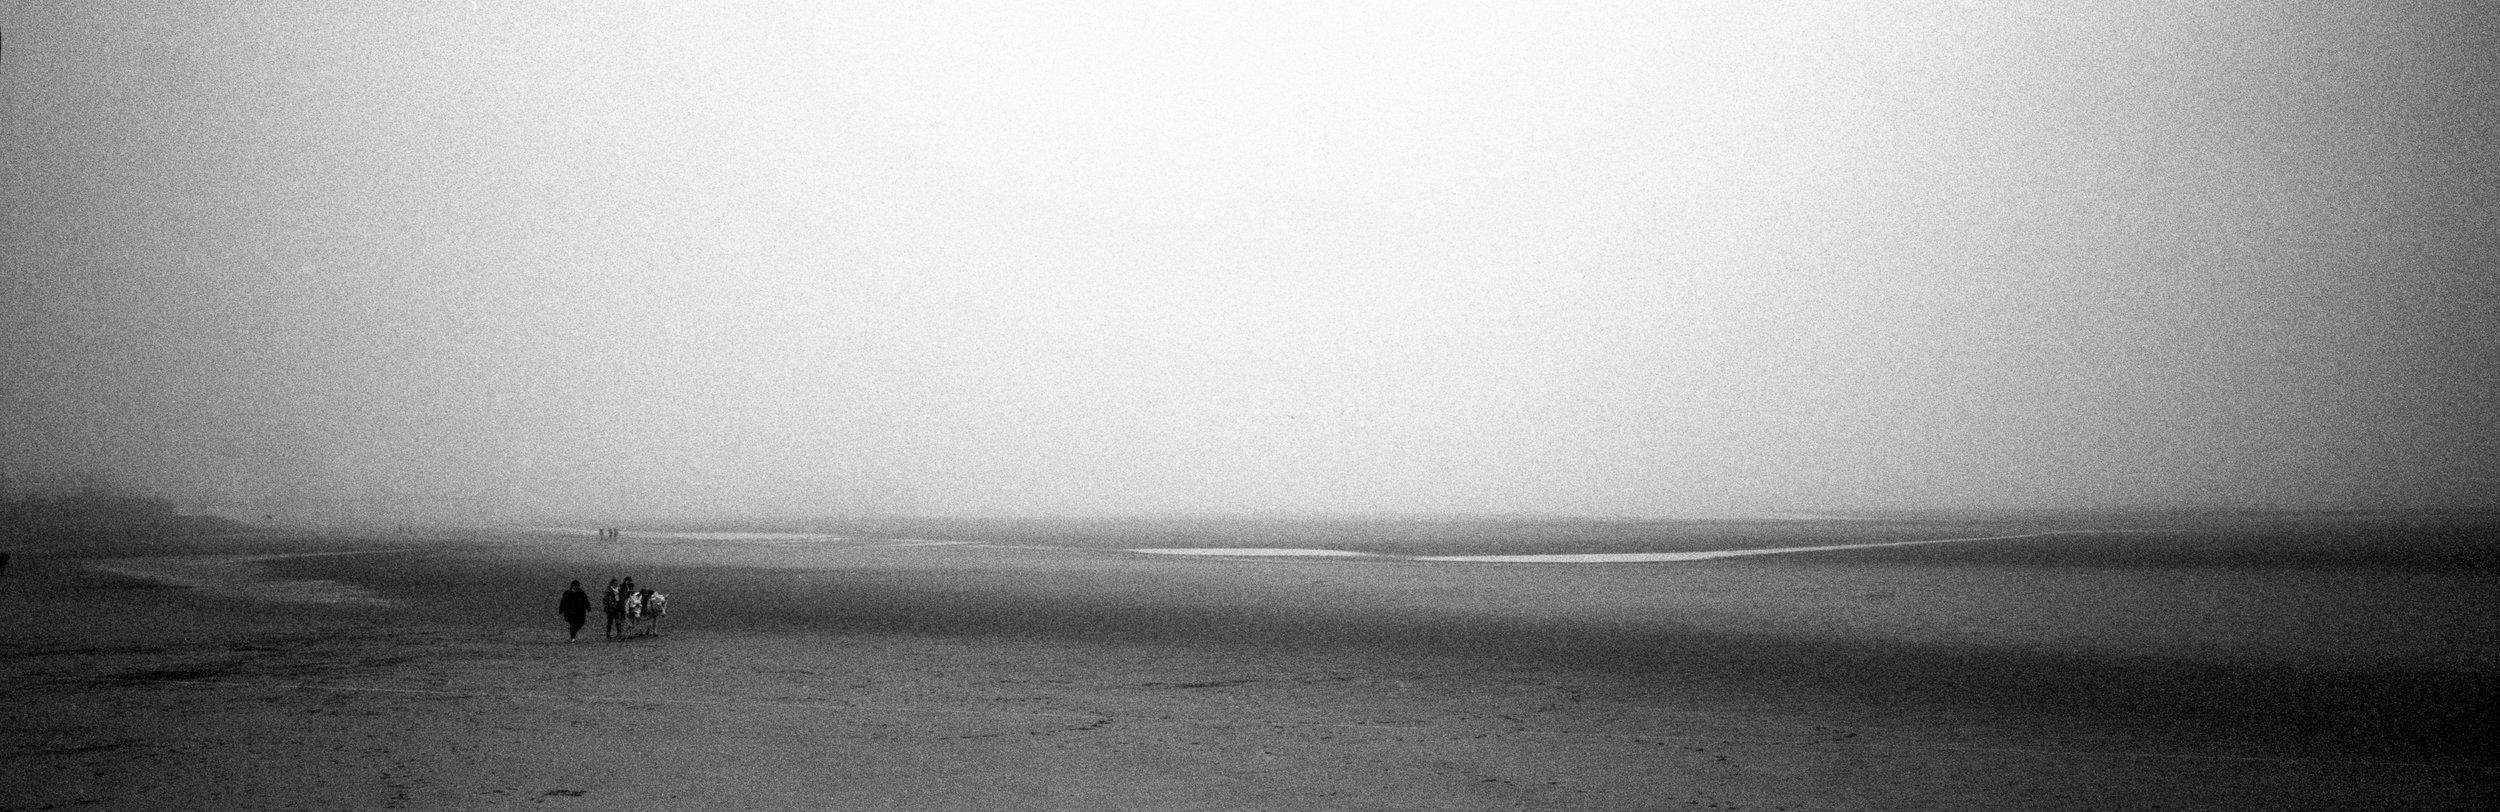 Landscape photography-5.jpg